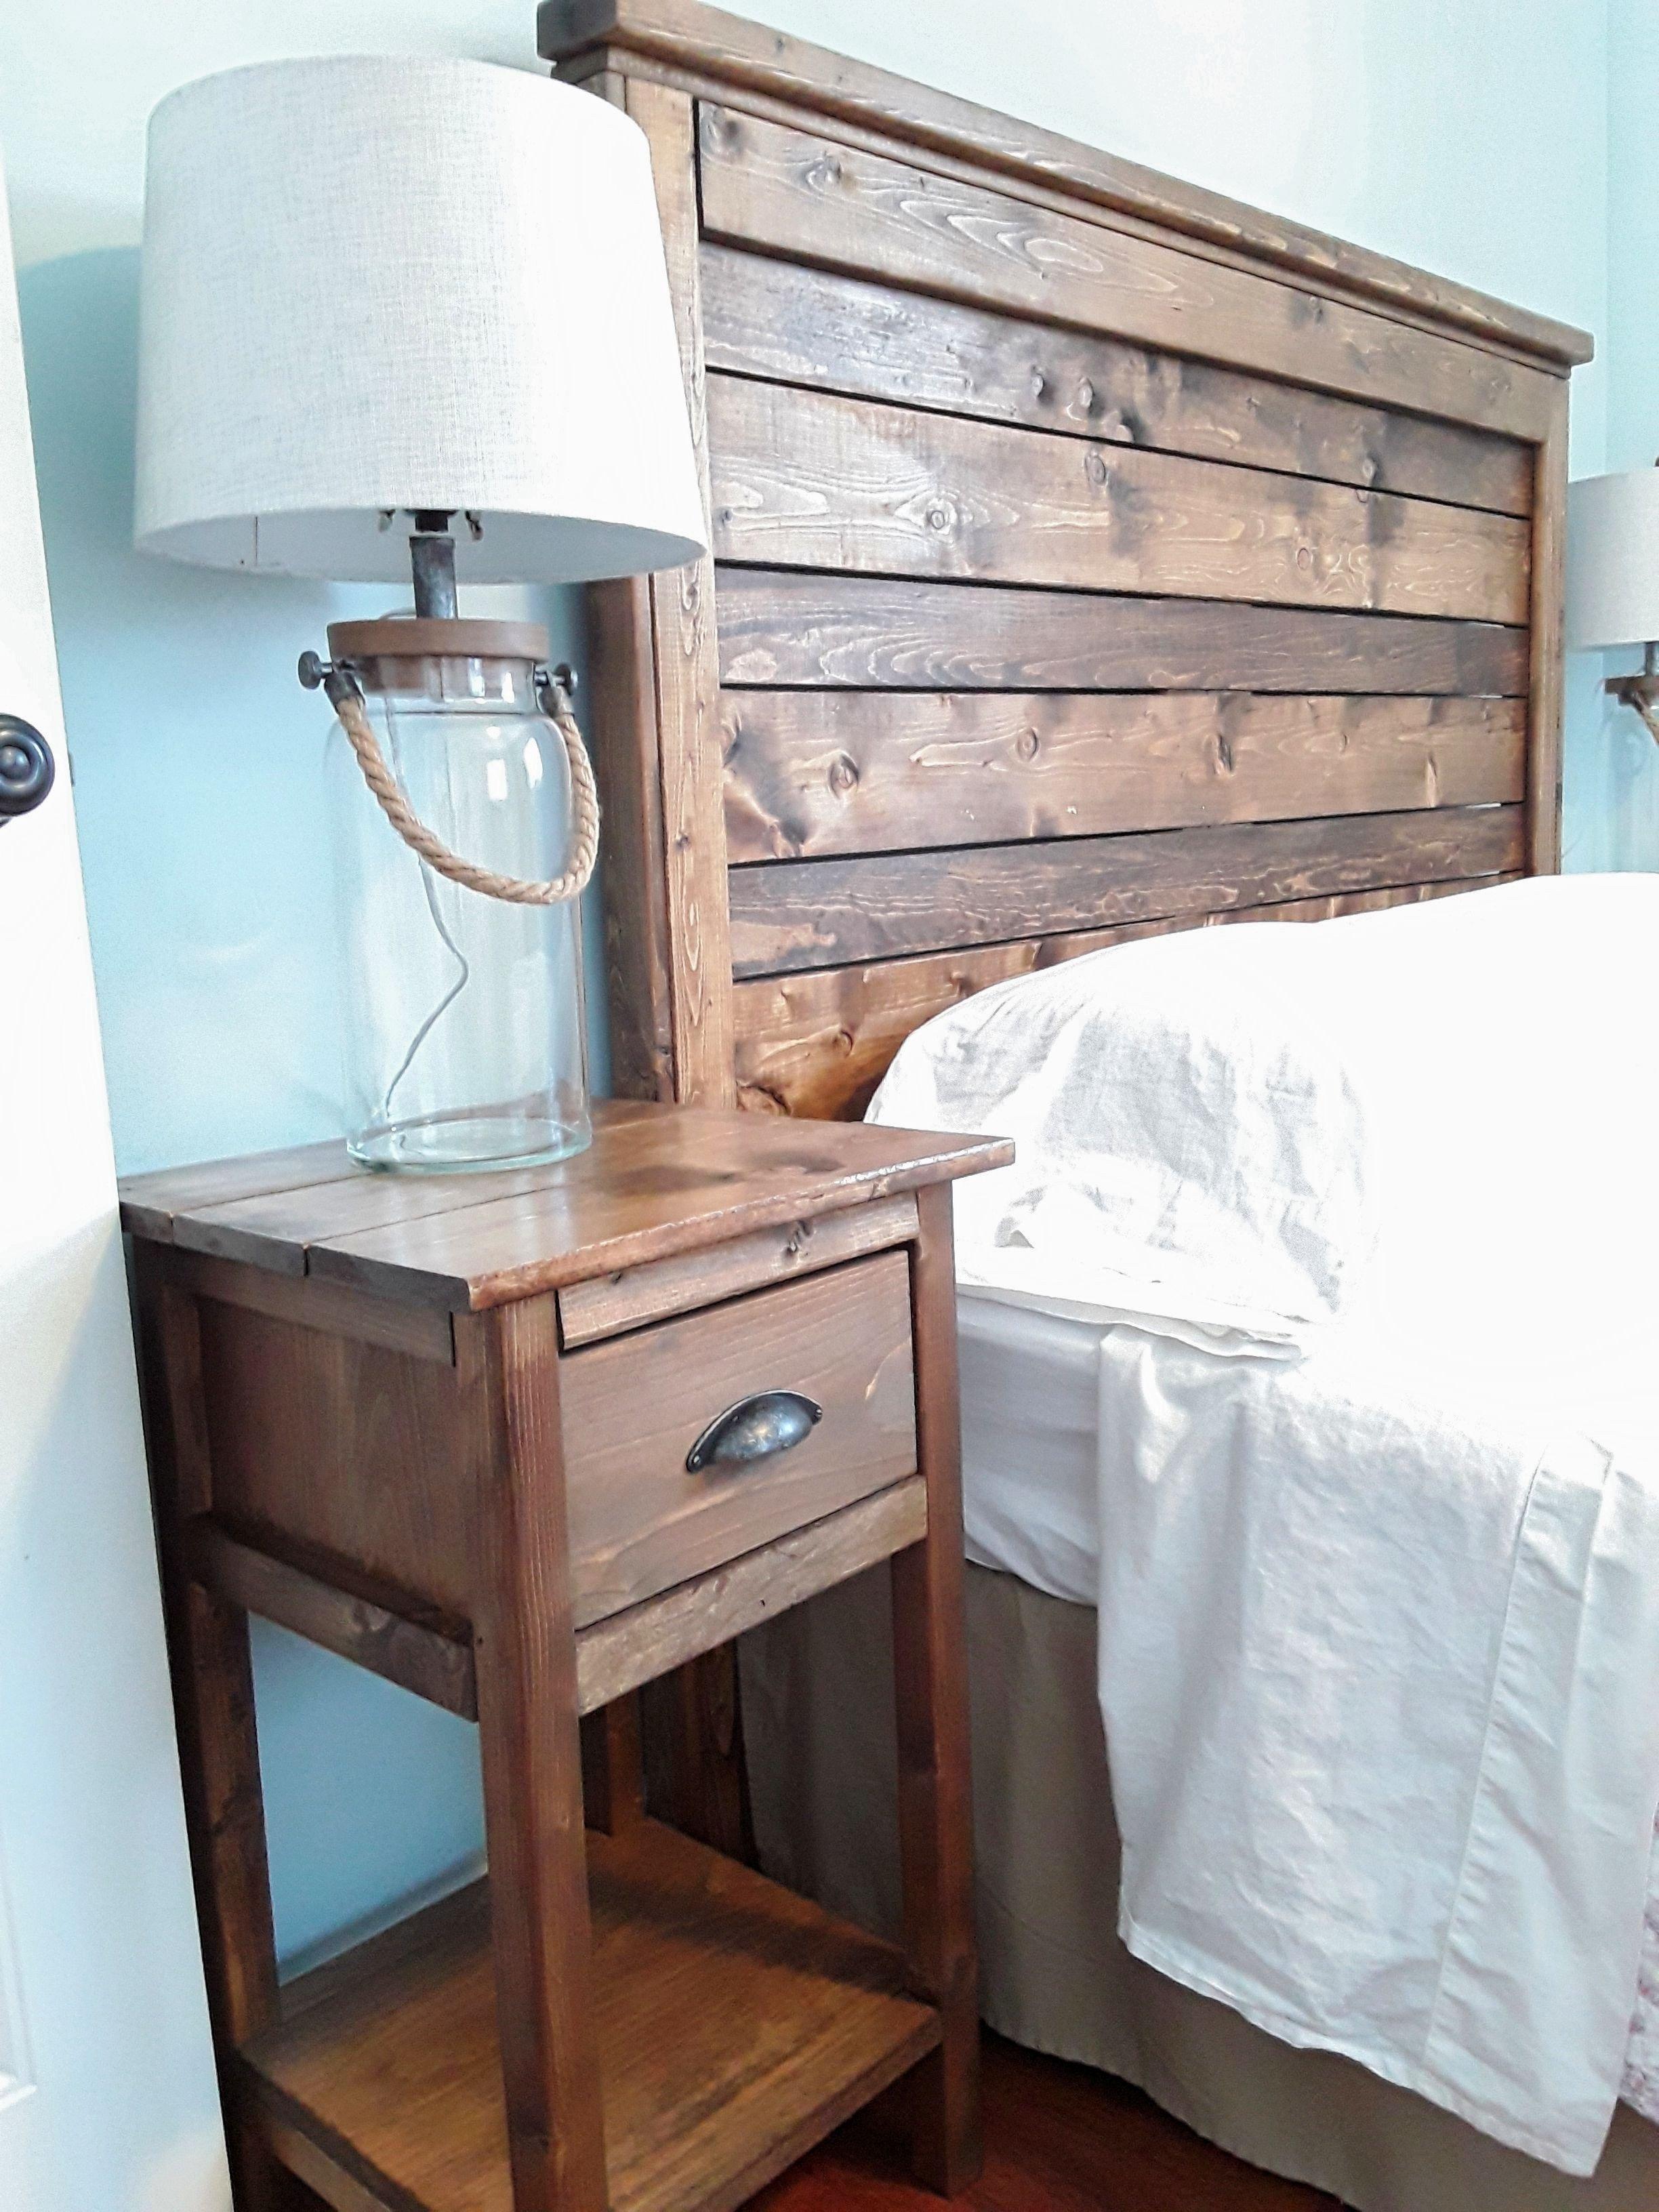 Log King Size Bedroom Set New Diy Rustic Wood Headboard and Nightstand